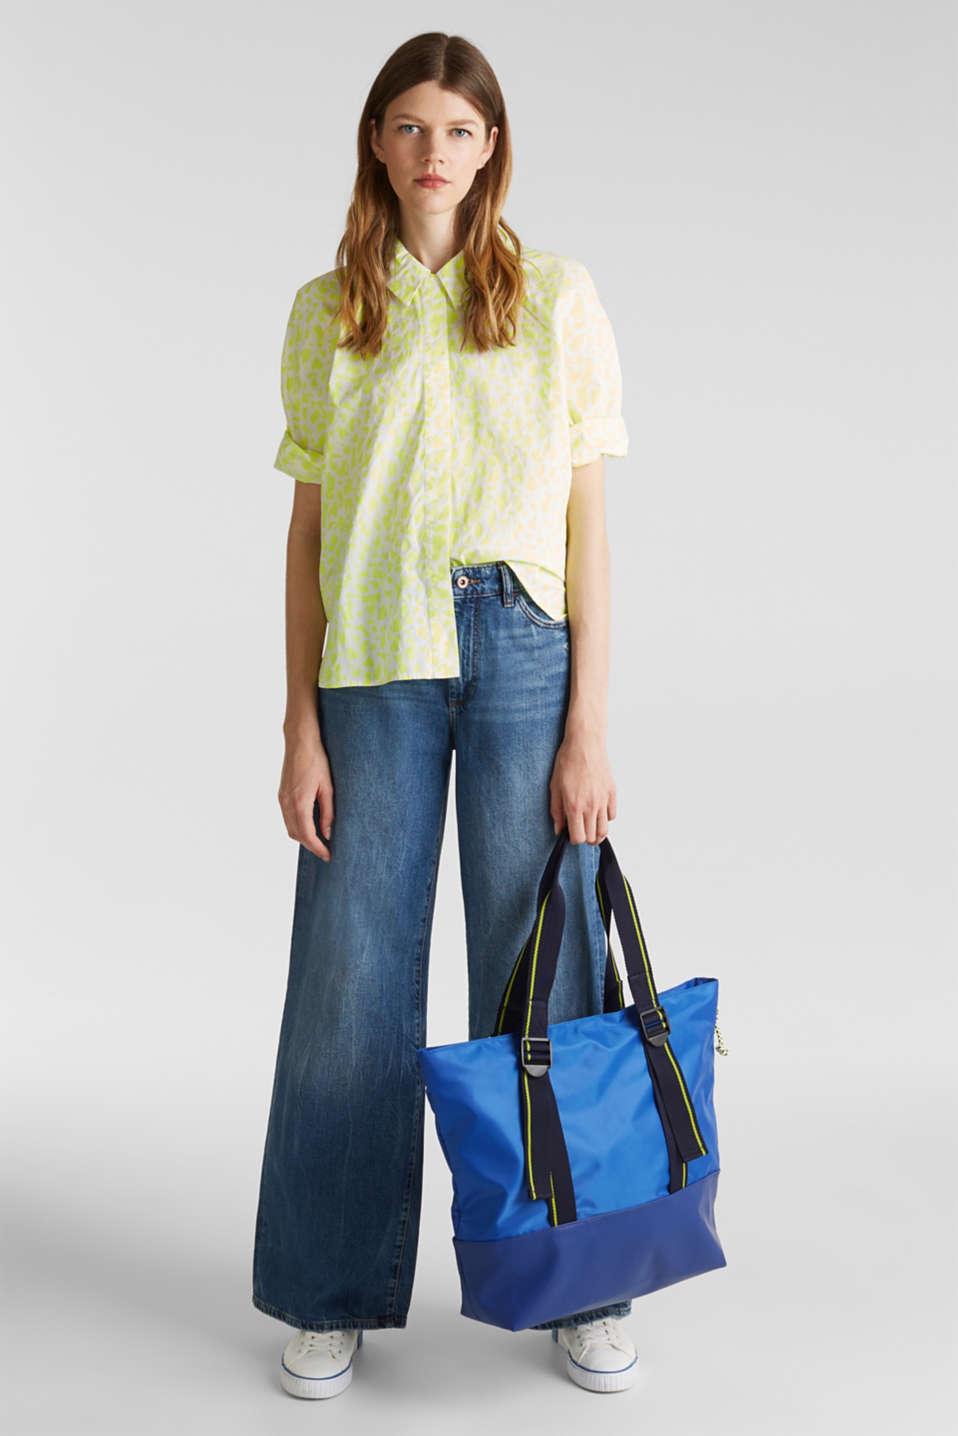 Nylon tote bag, BRIGHT BLUE, detail image number 1